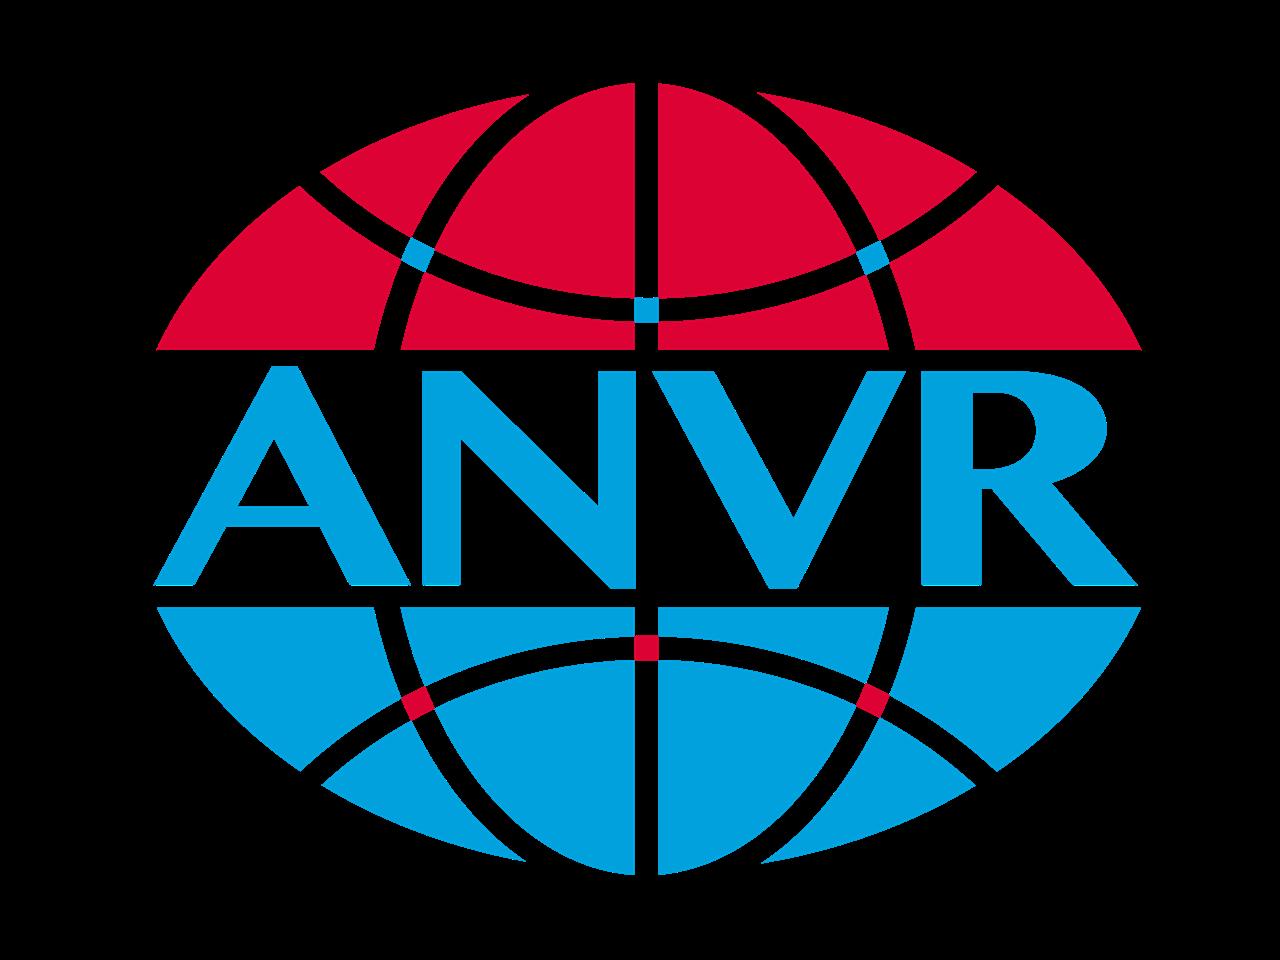 ANVR-logo-2019-(1).png